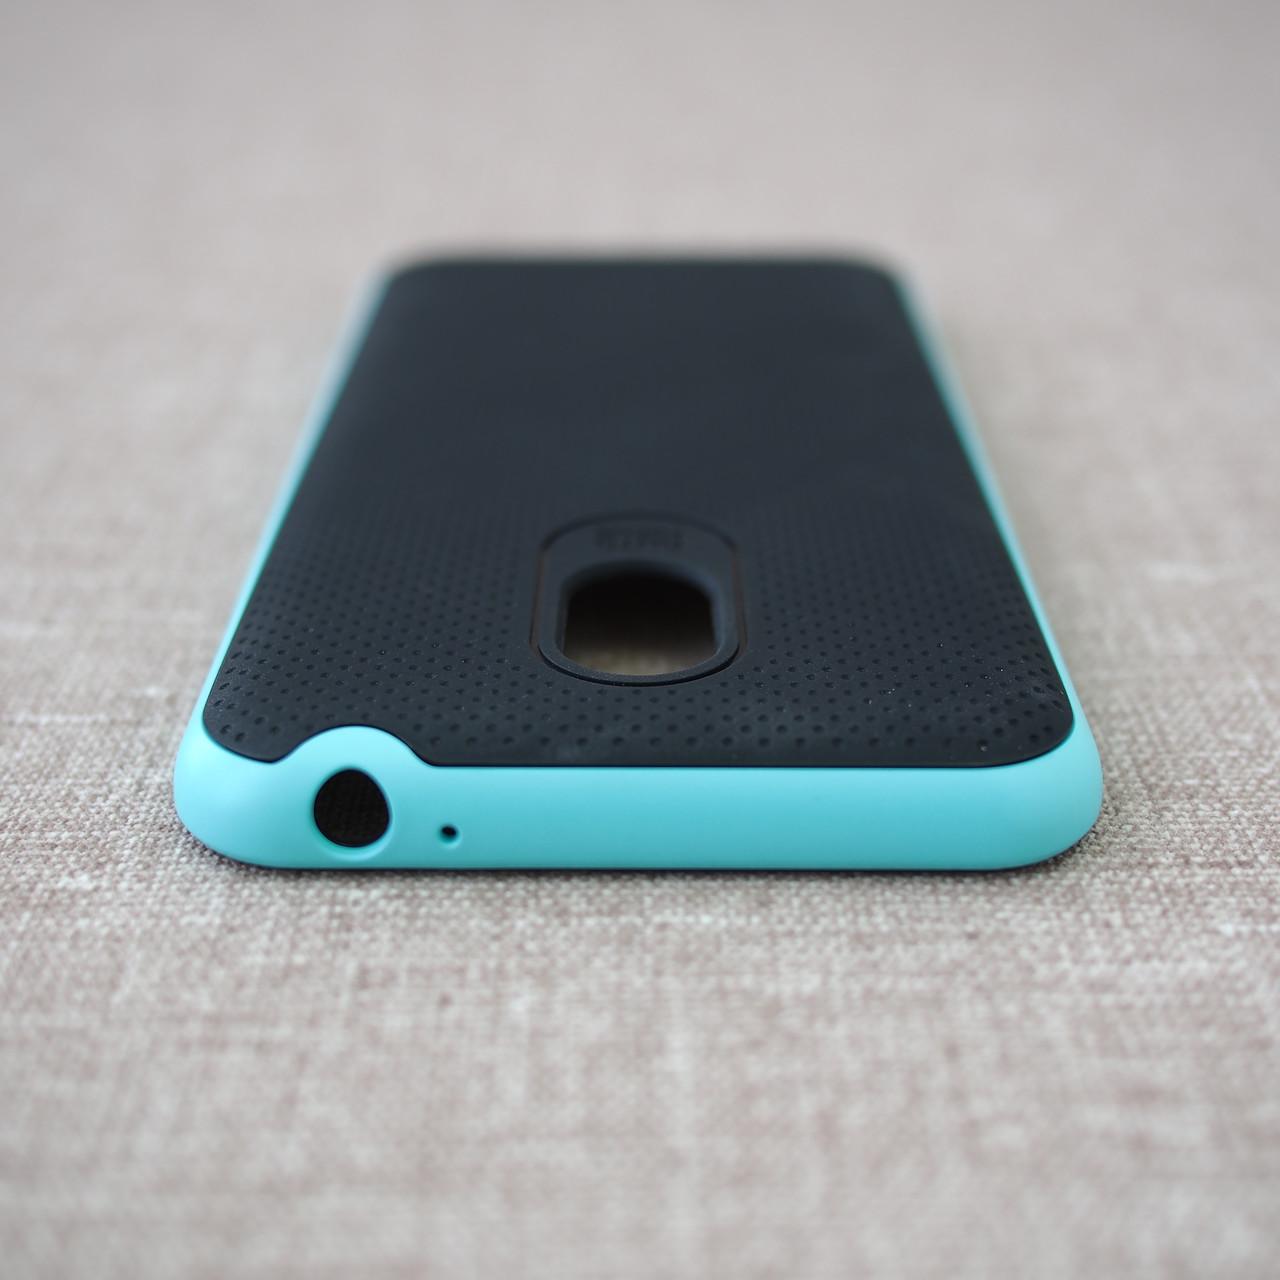 Чехлы для Meizu iPaky M2 Note black green Для телефона